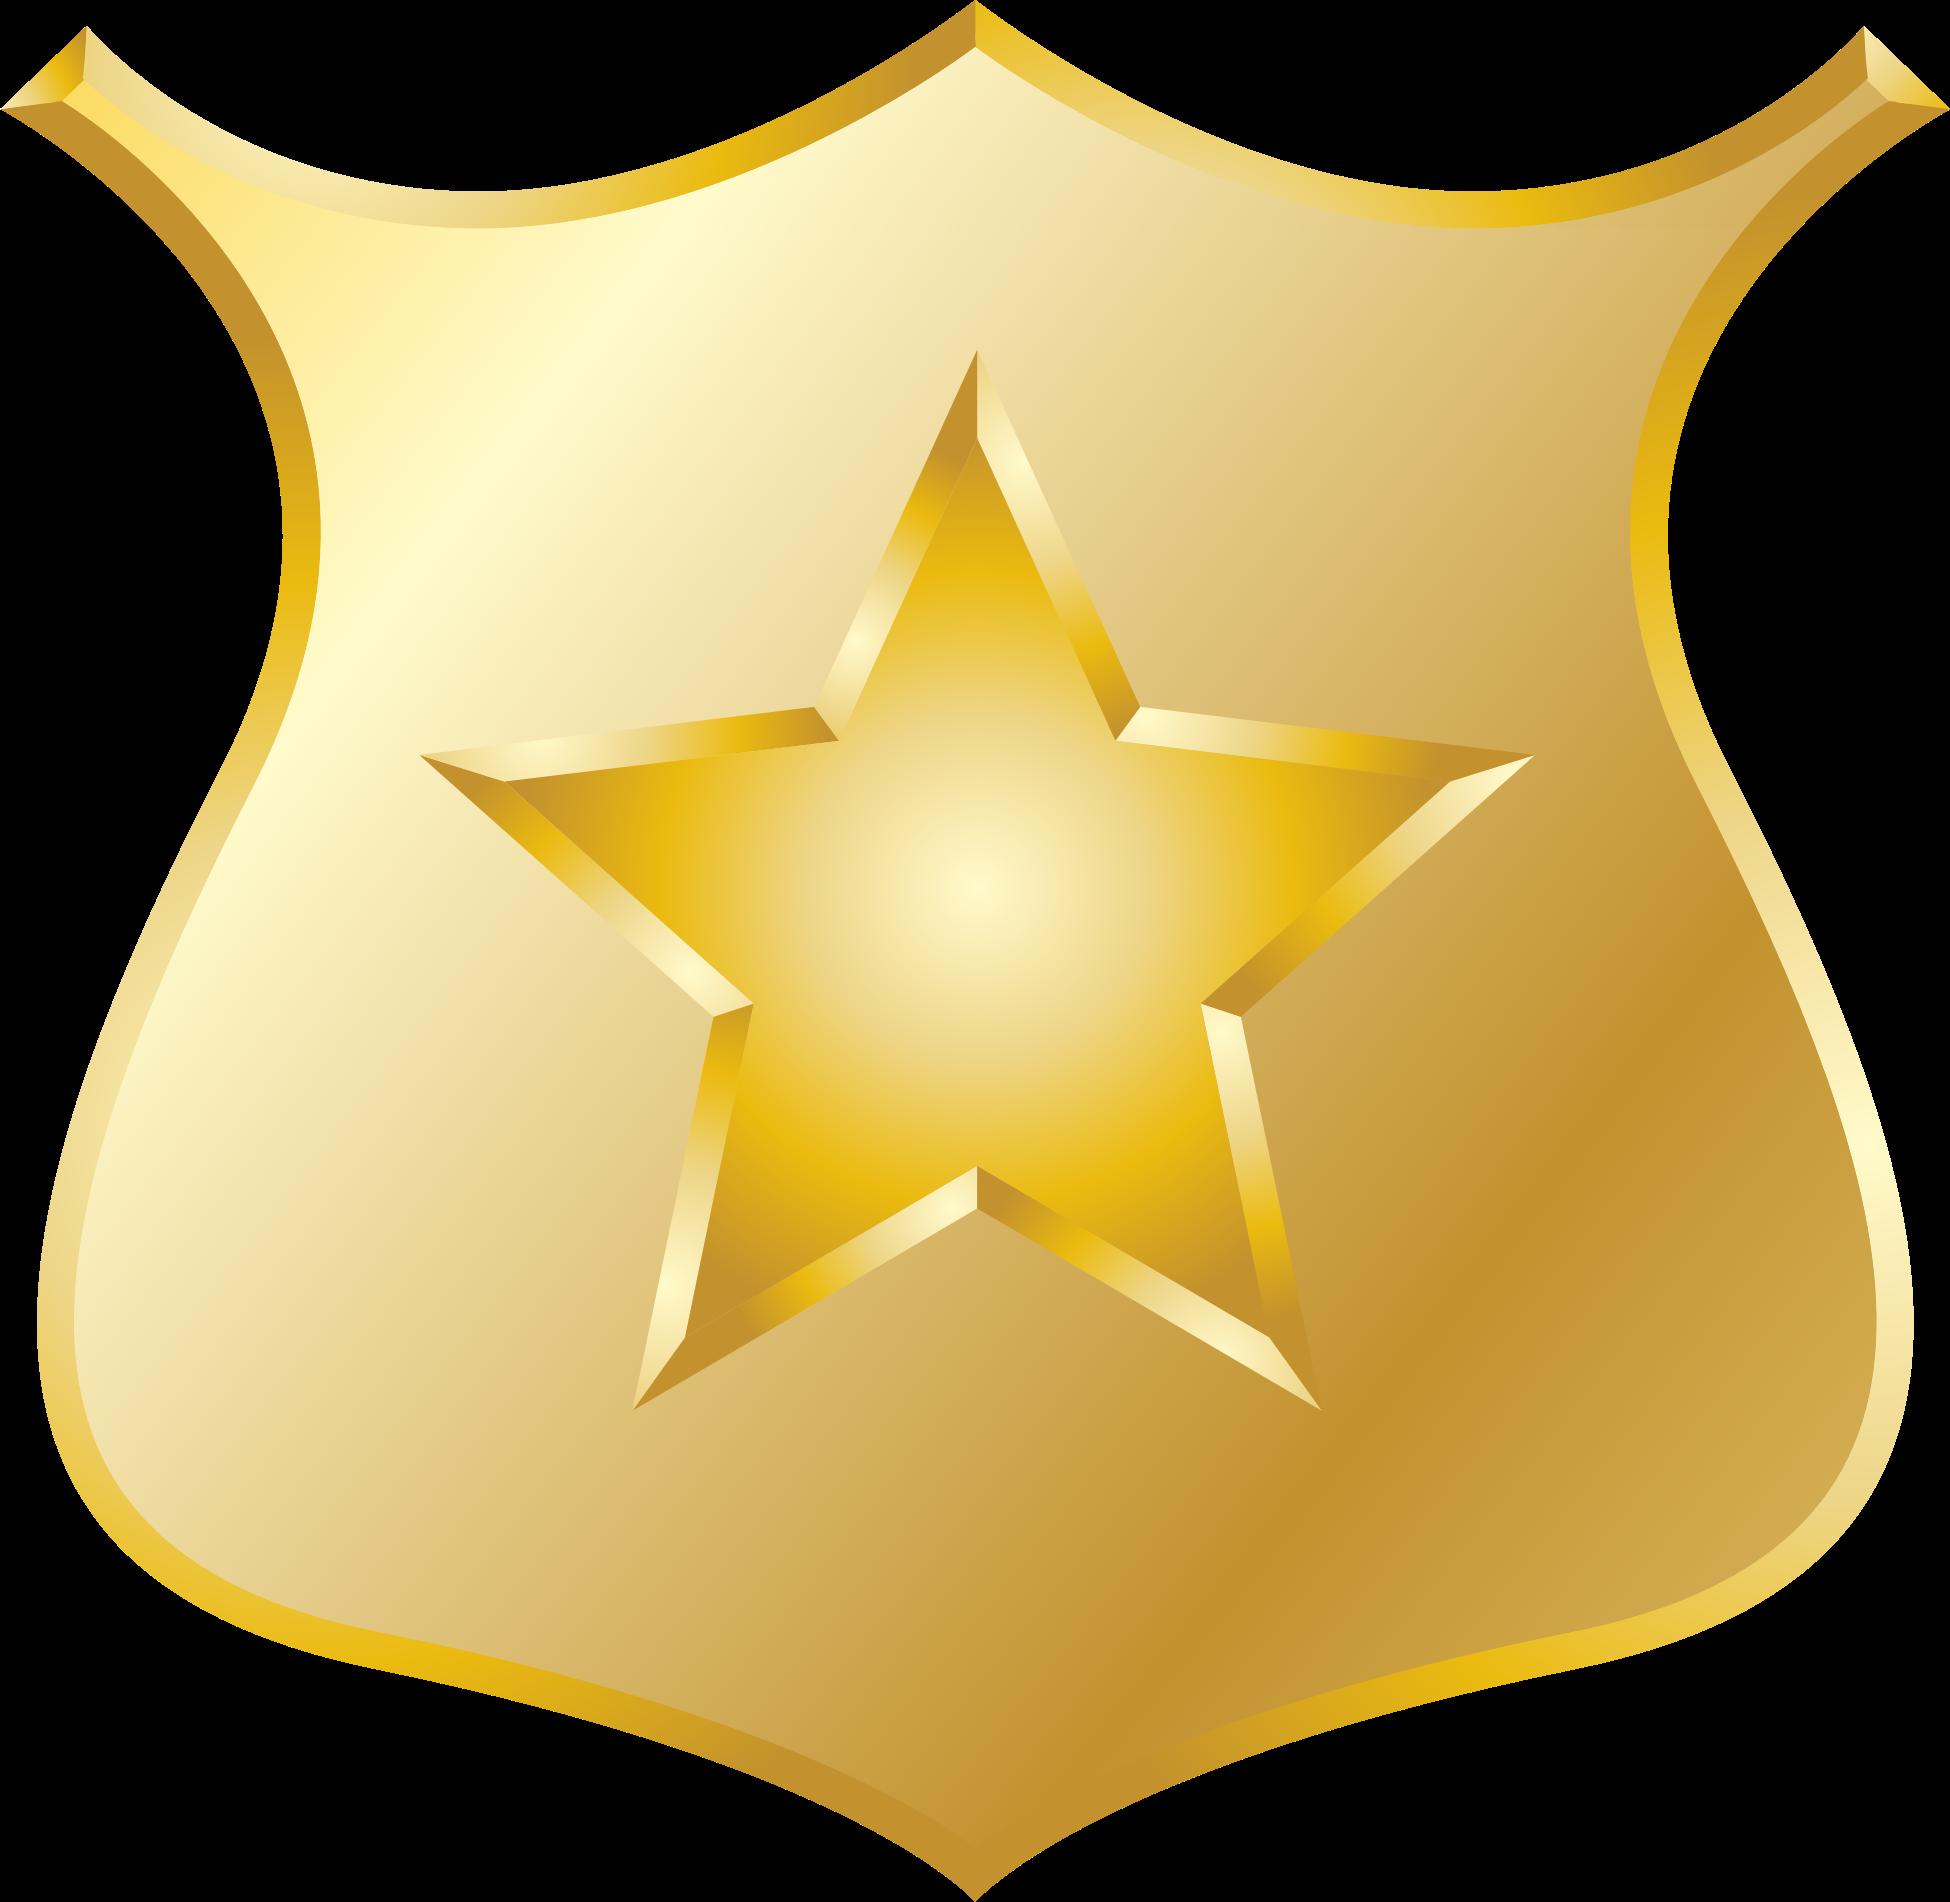 ... Clip Art further Sheriff Badge Clip Art. on sheriff star badge clip